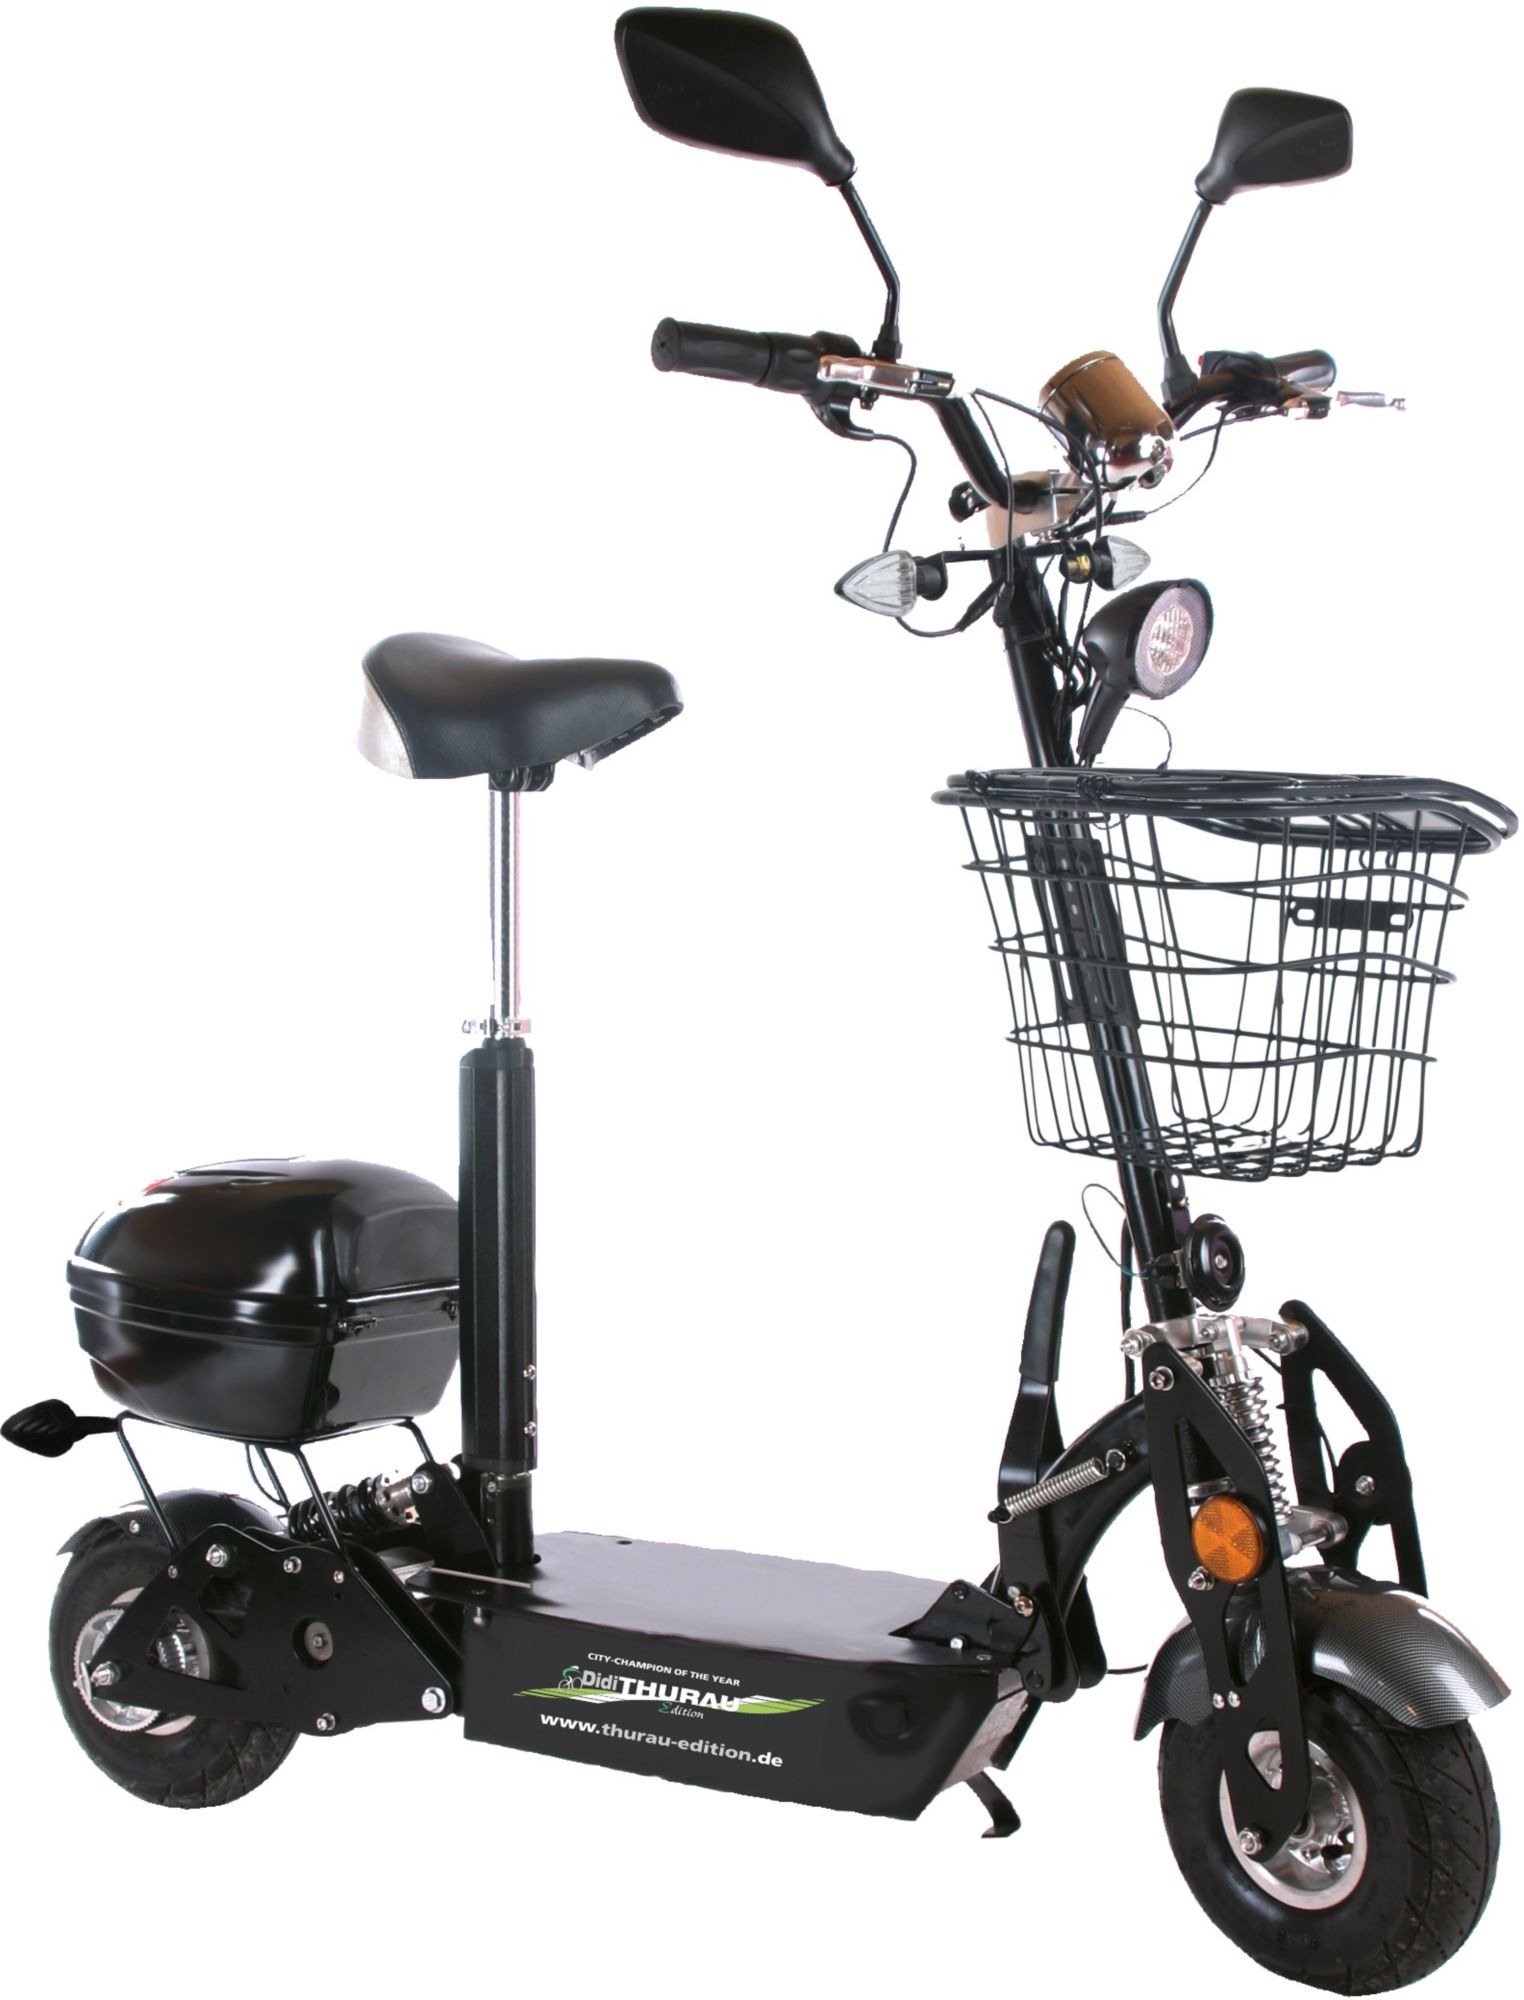 DIDI THURAU EDITION Didi Thurau Edition Elektro City Roller, 20 km/h, »Safety Plus«